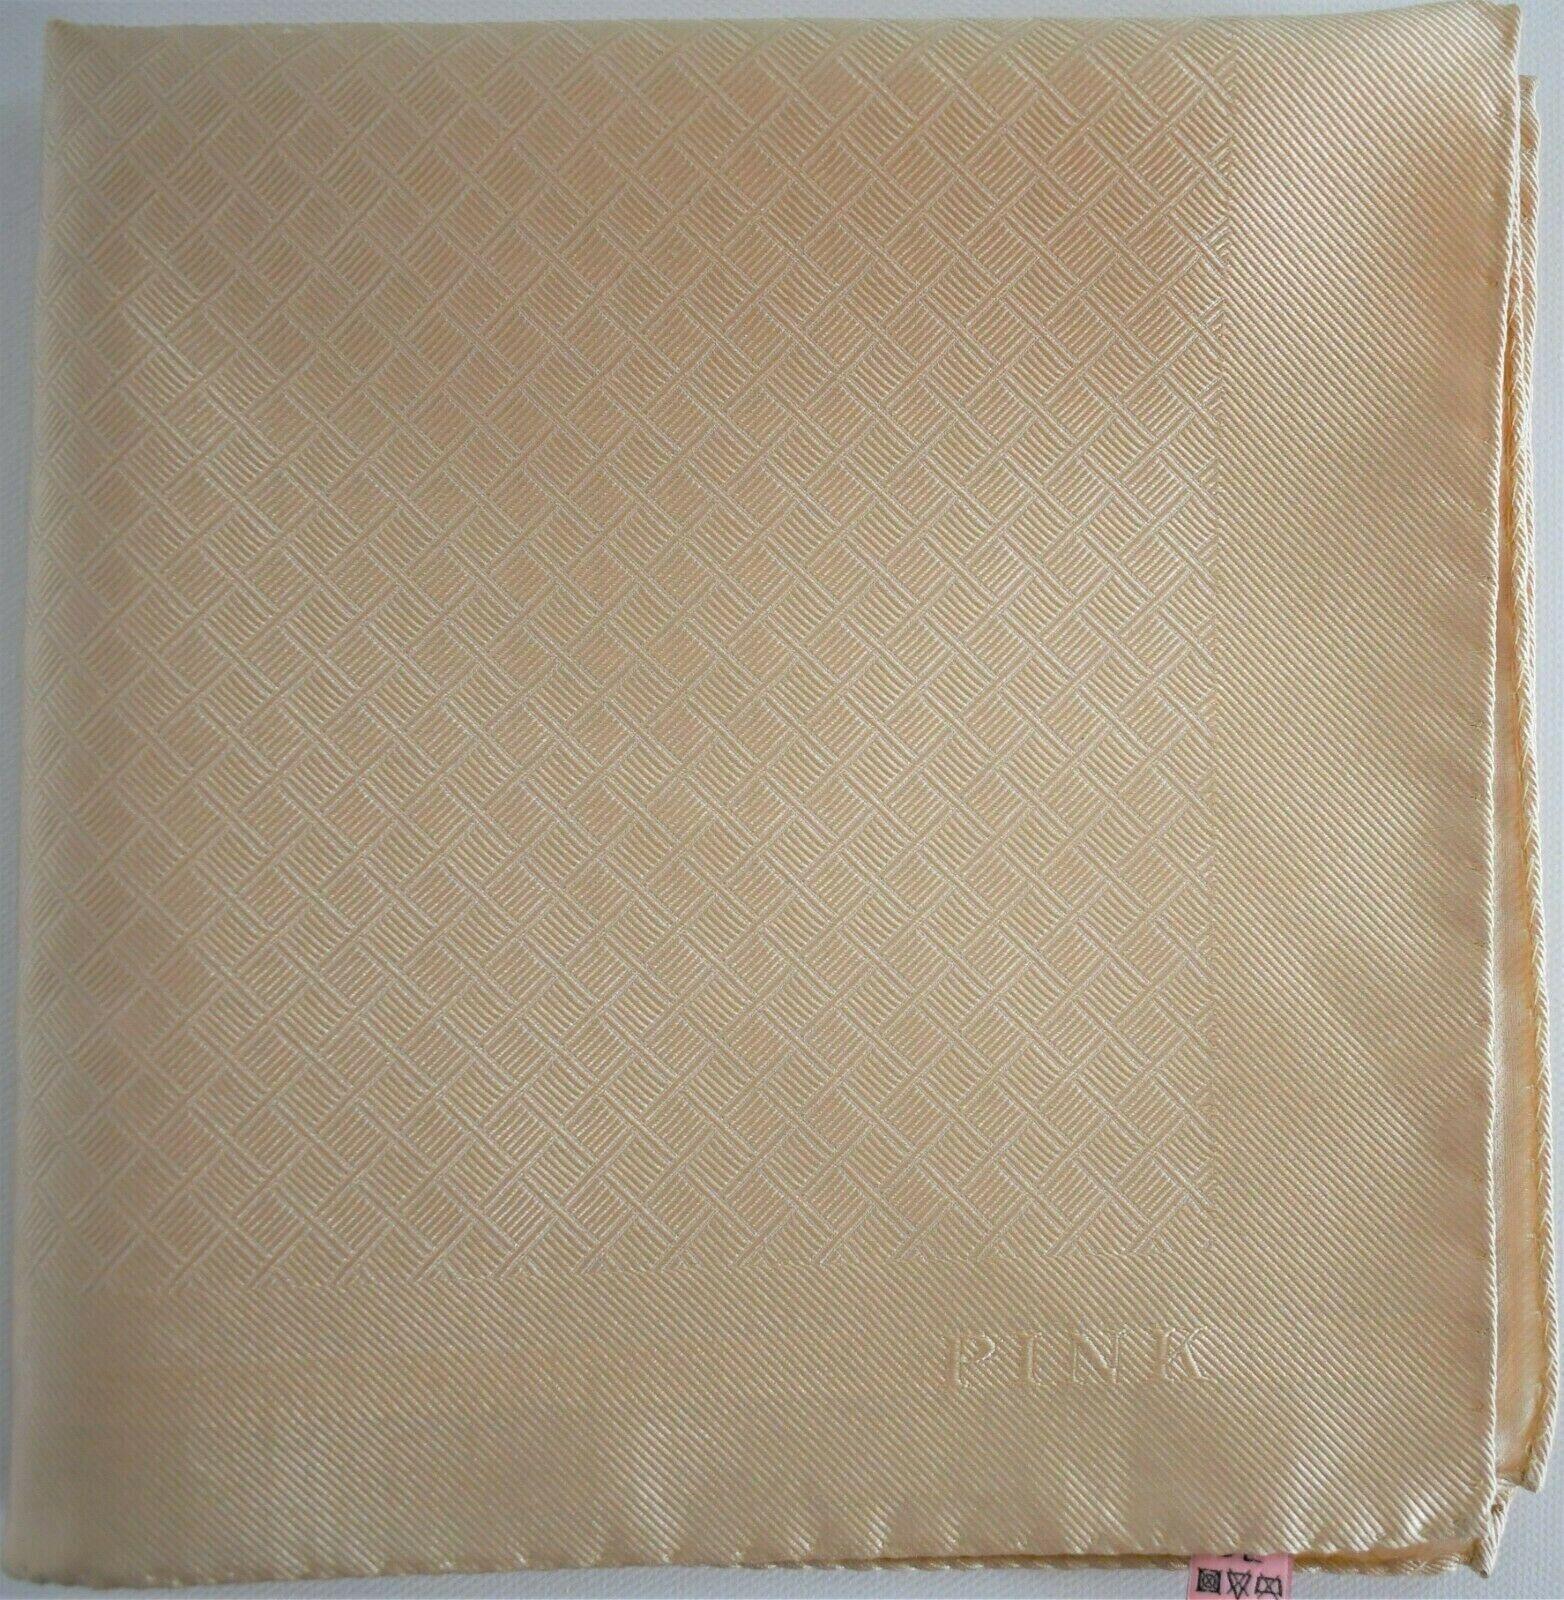 New THOMAS PINK Cream 100% SILK Woven Pocket Square Handkerchief ITALY